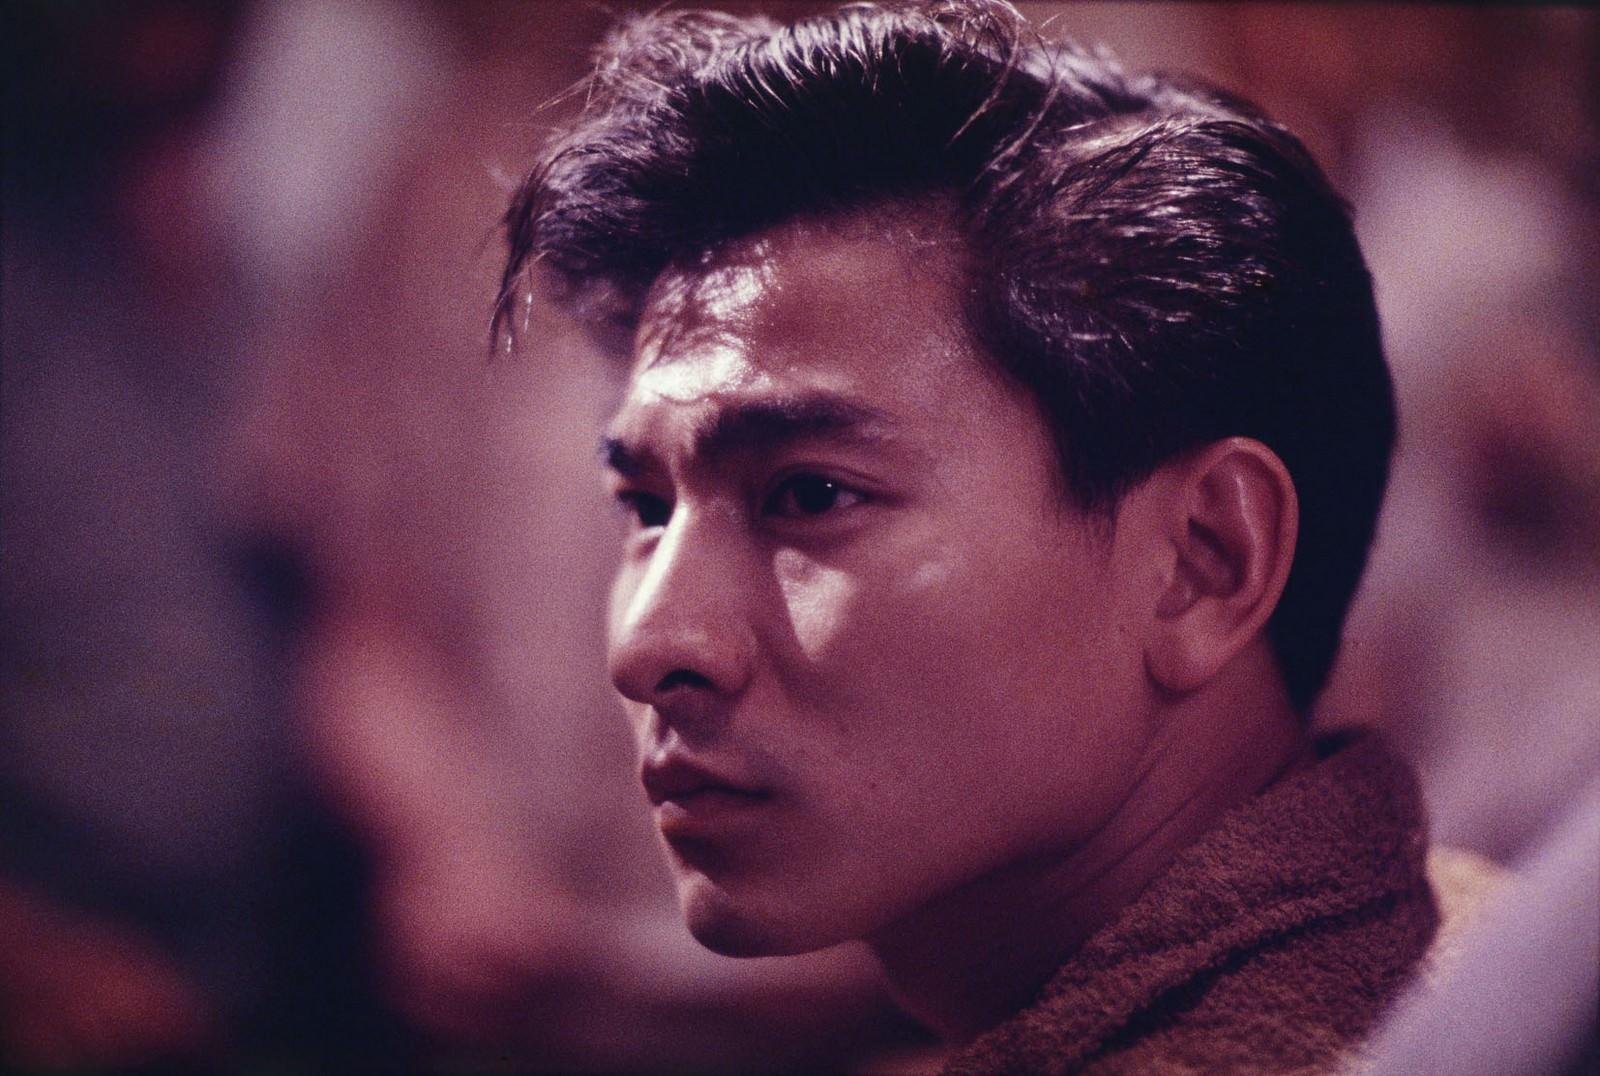 Movie, 阿飛正傳(香港, 1990) / 阿飛正傳(台灣) / 阿飞正传(中國) / Days of Being Wild(英文), 電影劇照, 角色與演員介紹